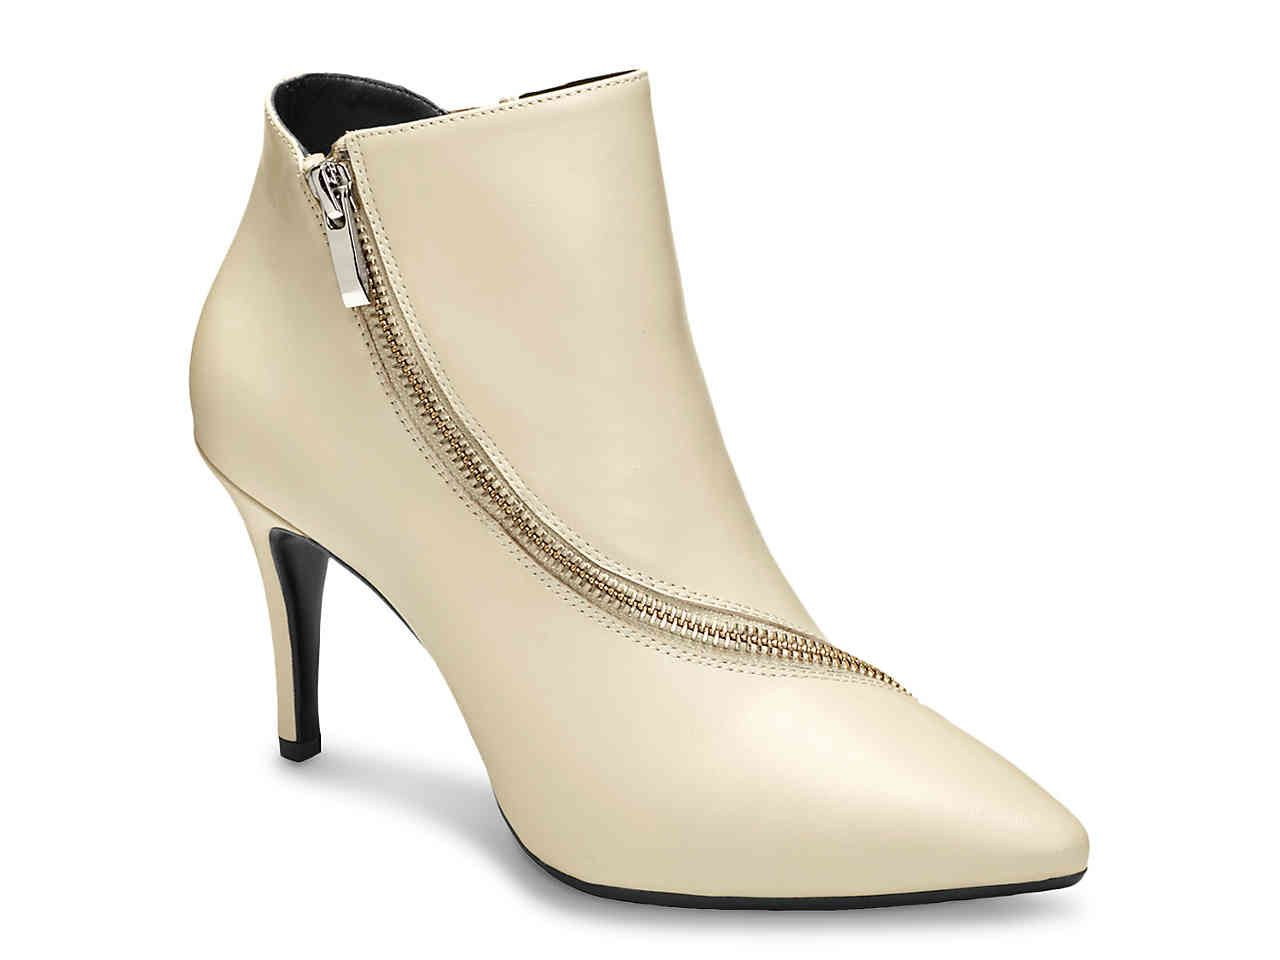 Aerosoles Deadline Bootie Aerosoles Leather Ankle Boots Stiletto Heels